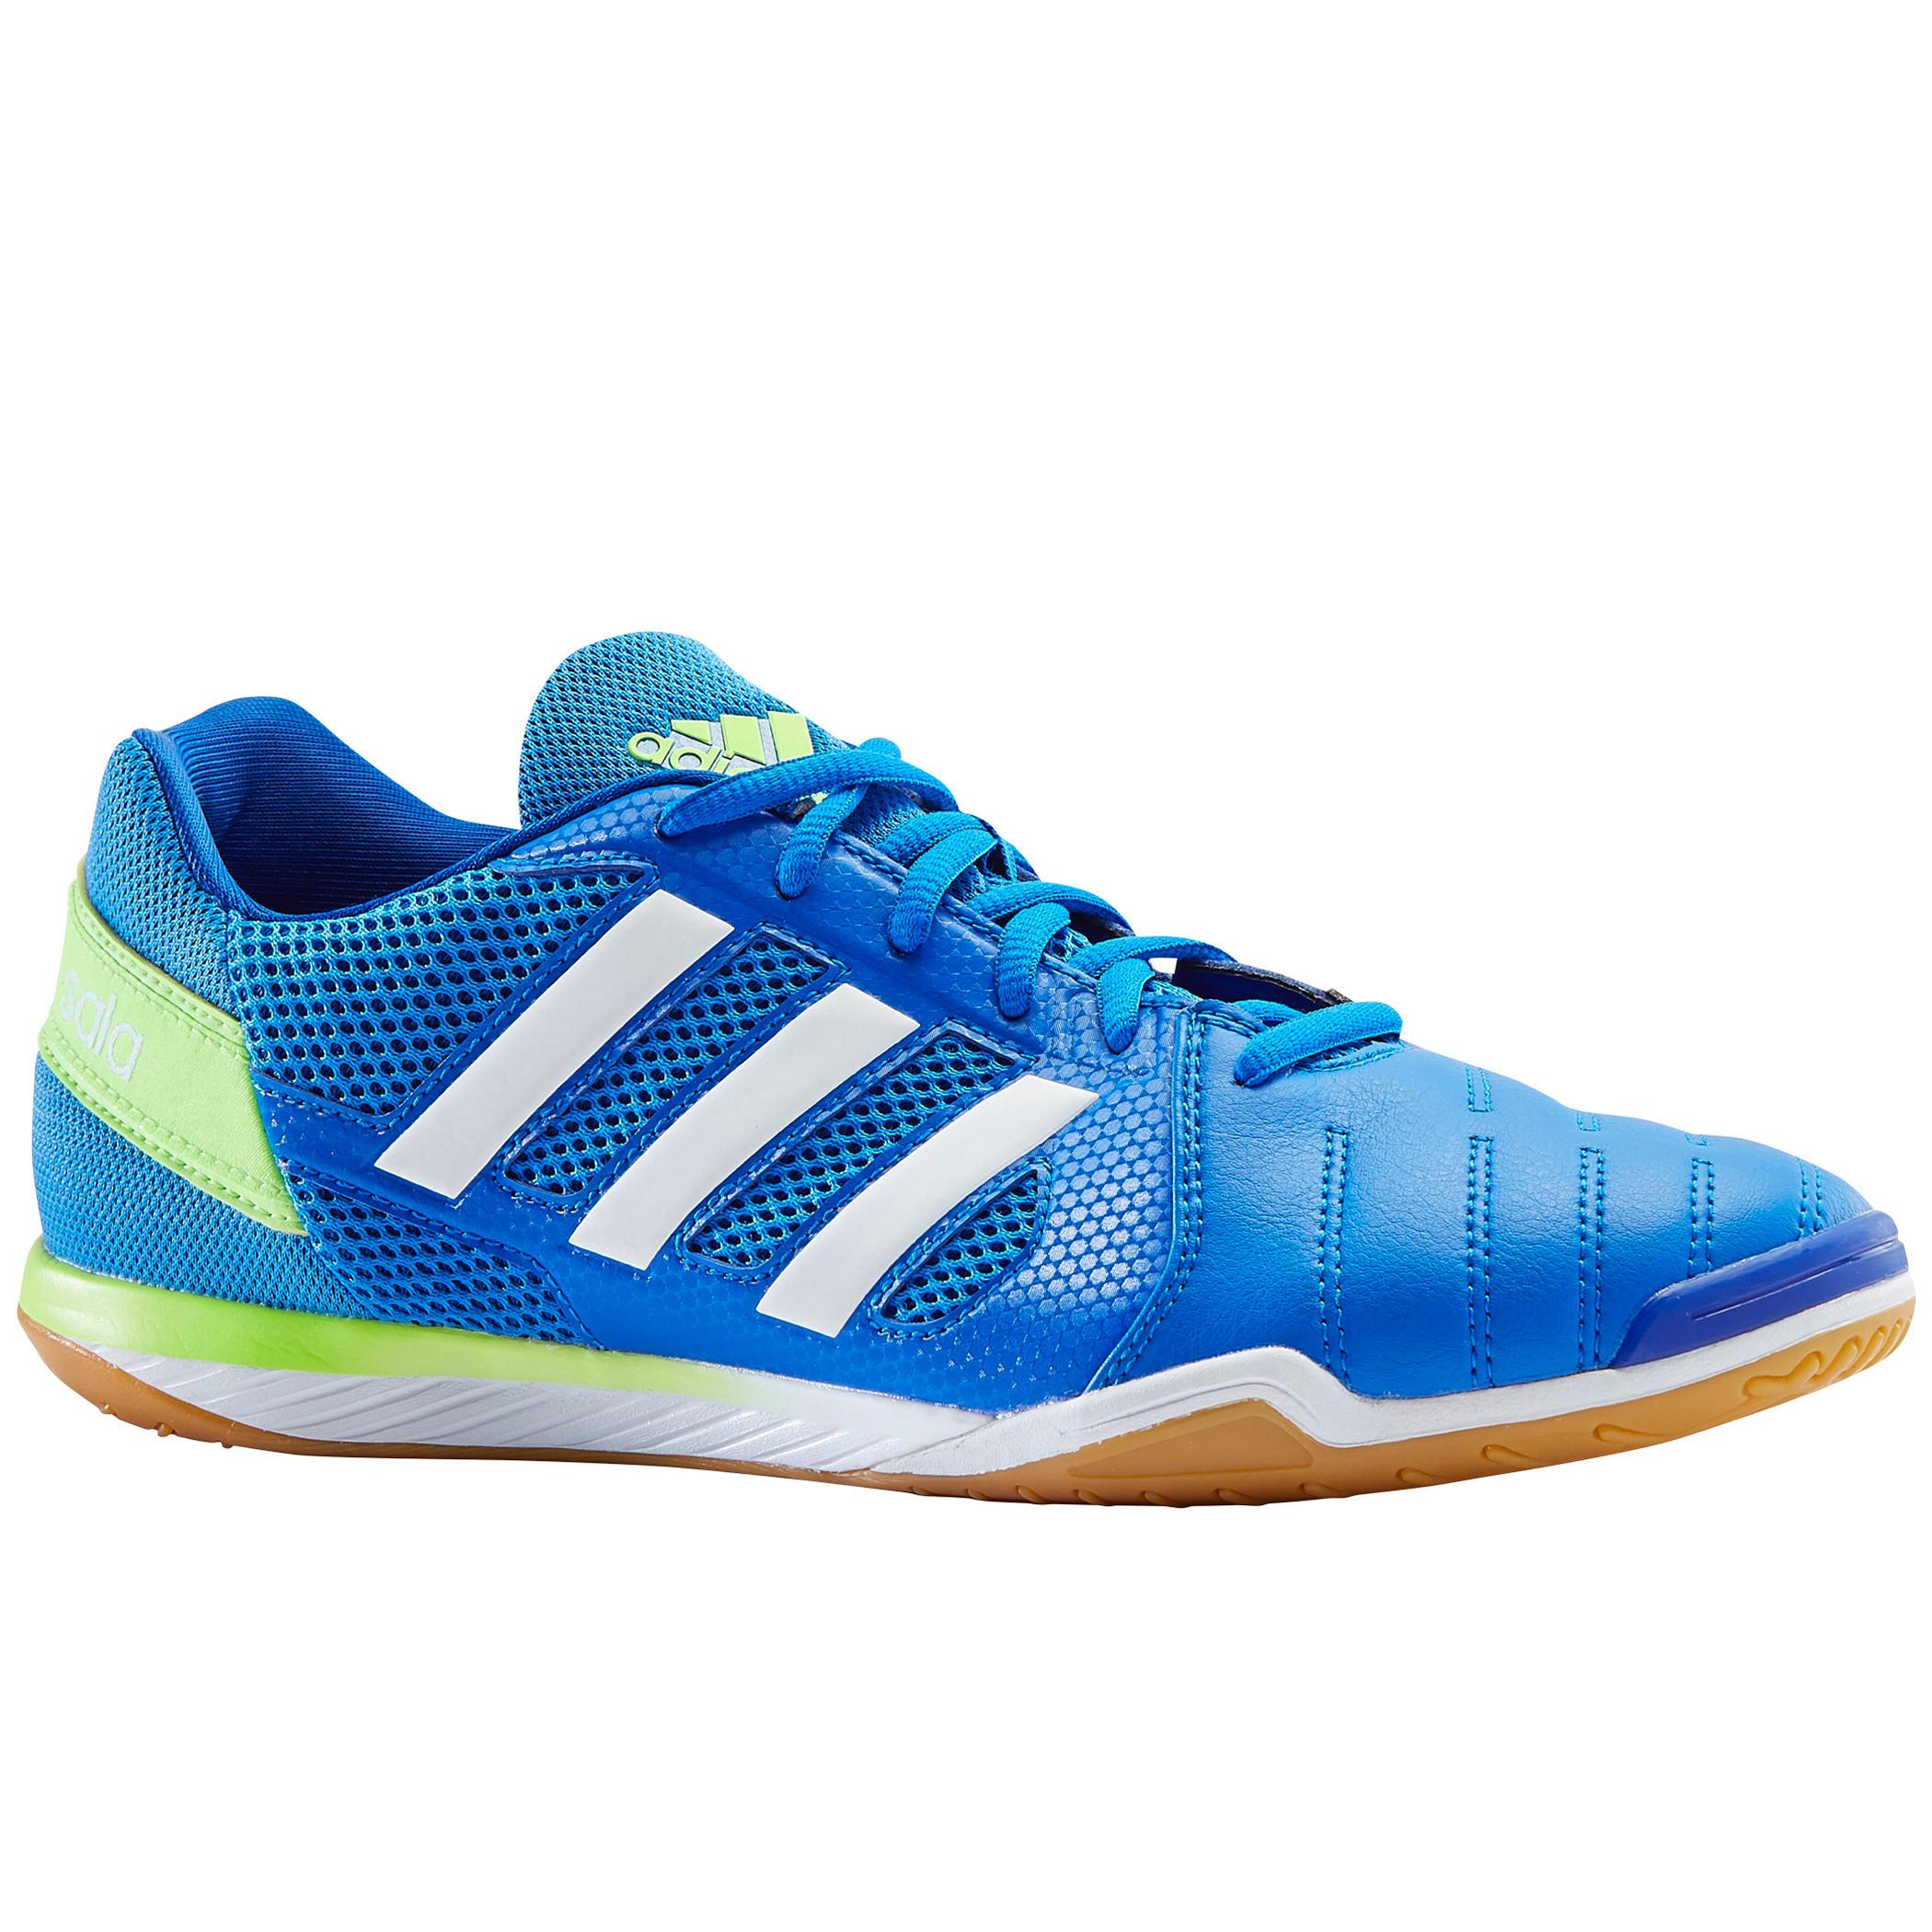 Hallenschuhe Top Sala blau/grün   Schuhe > Sportschuhe > Hallenschuhe   Adidas